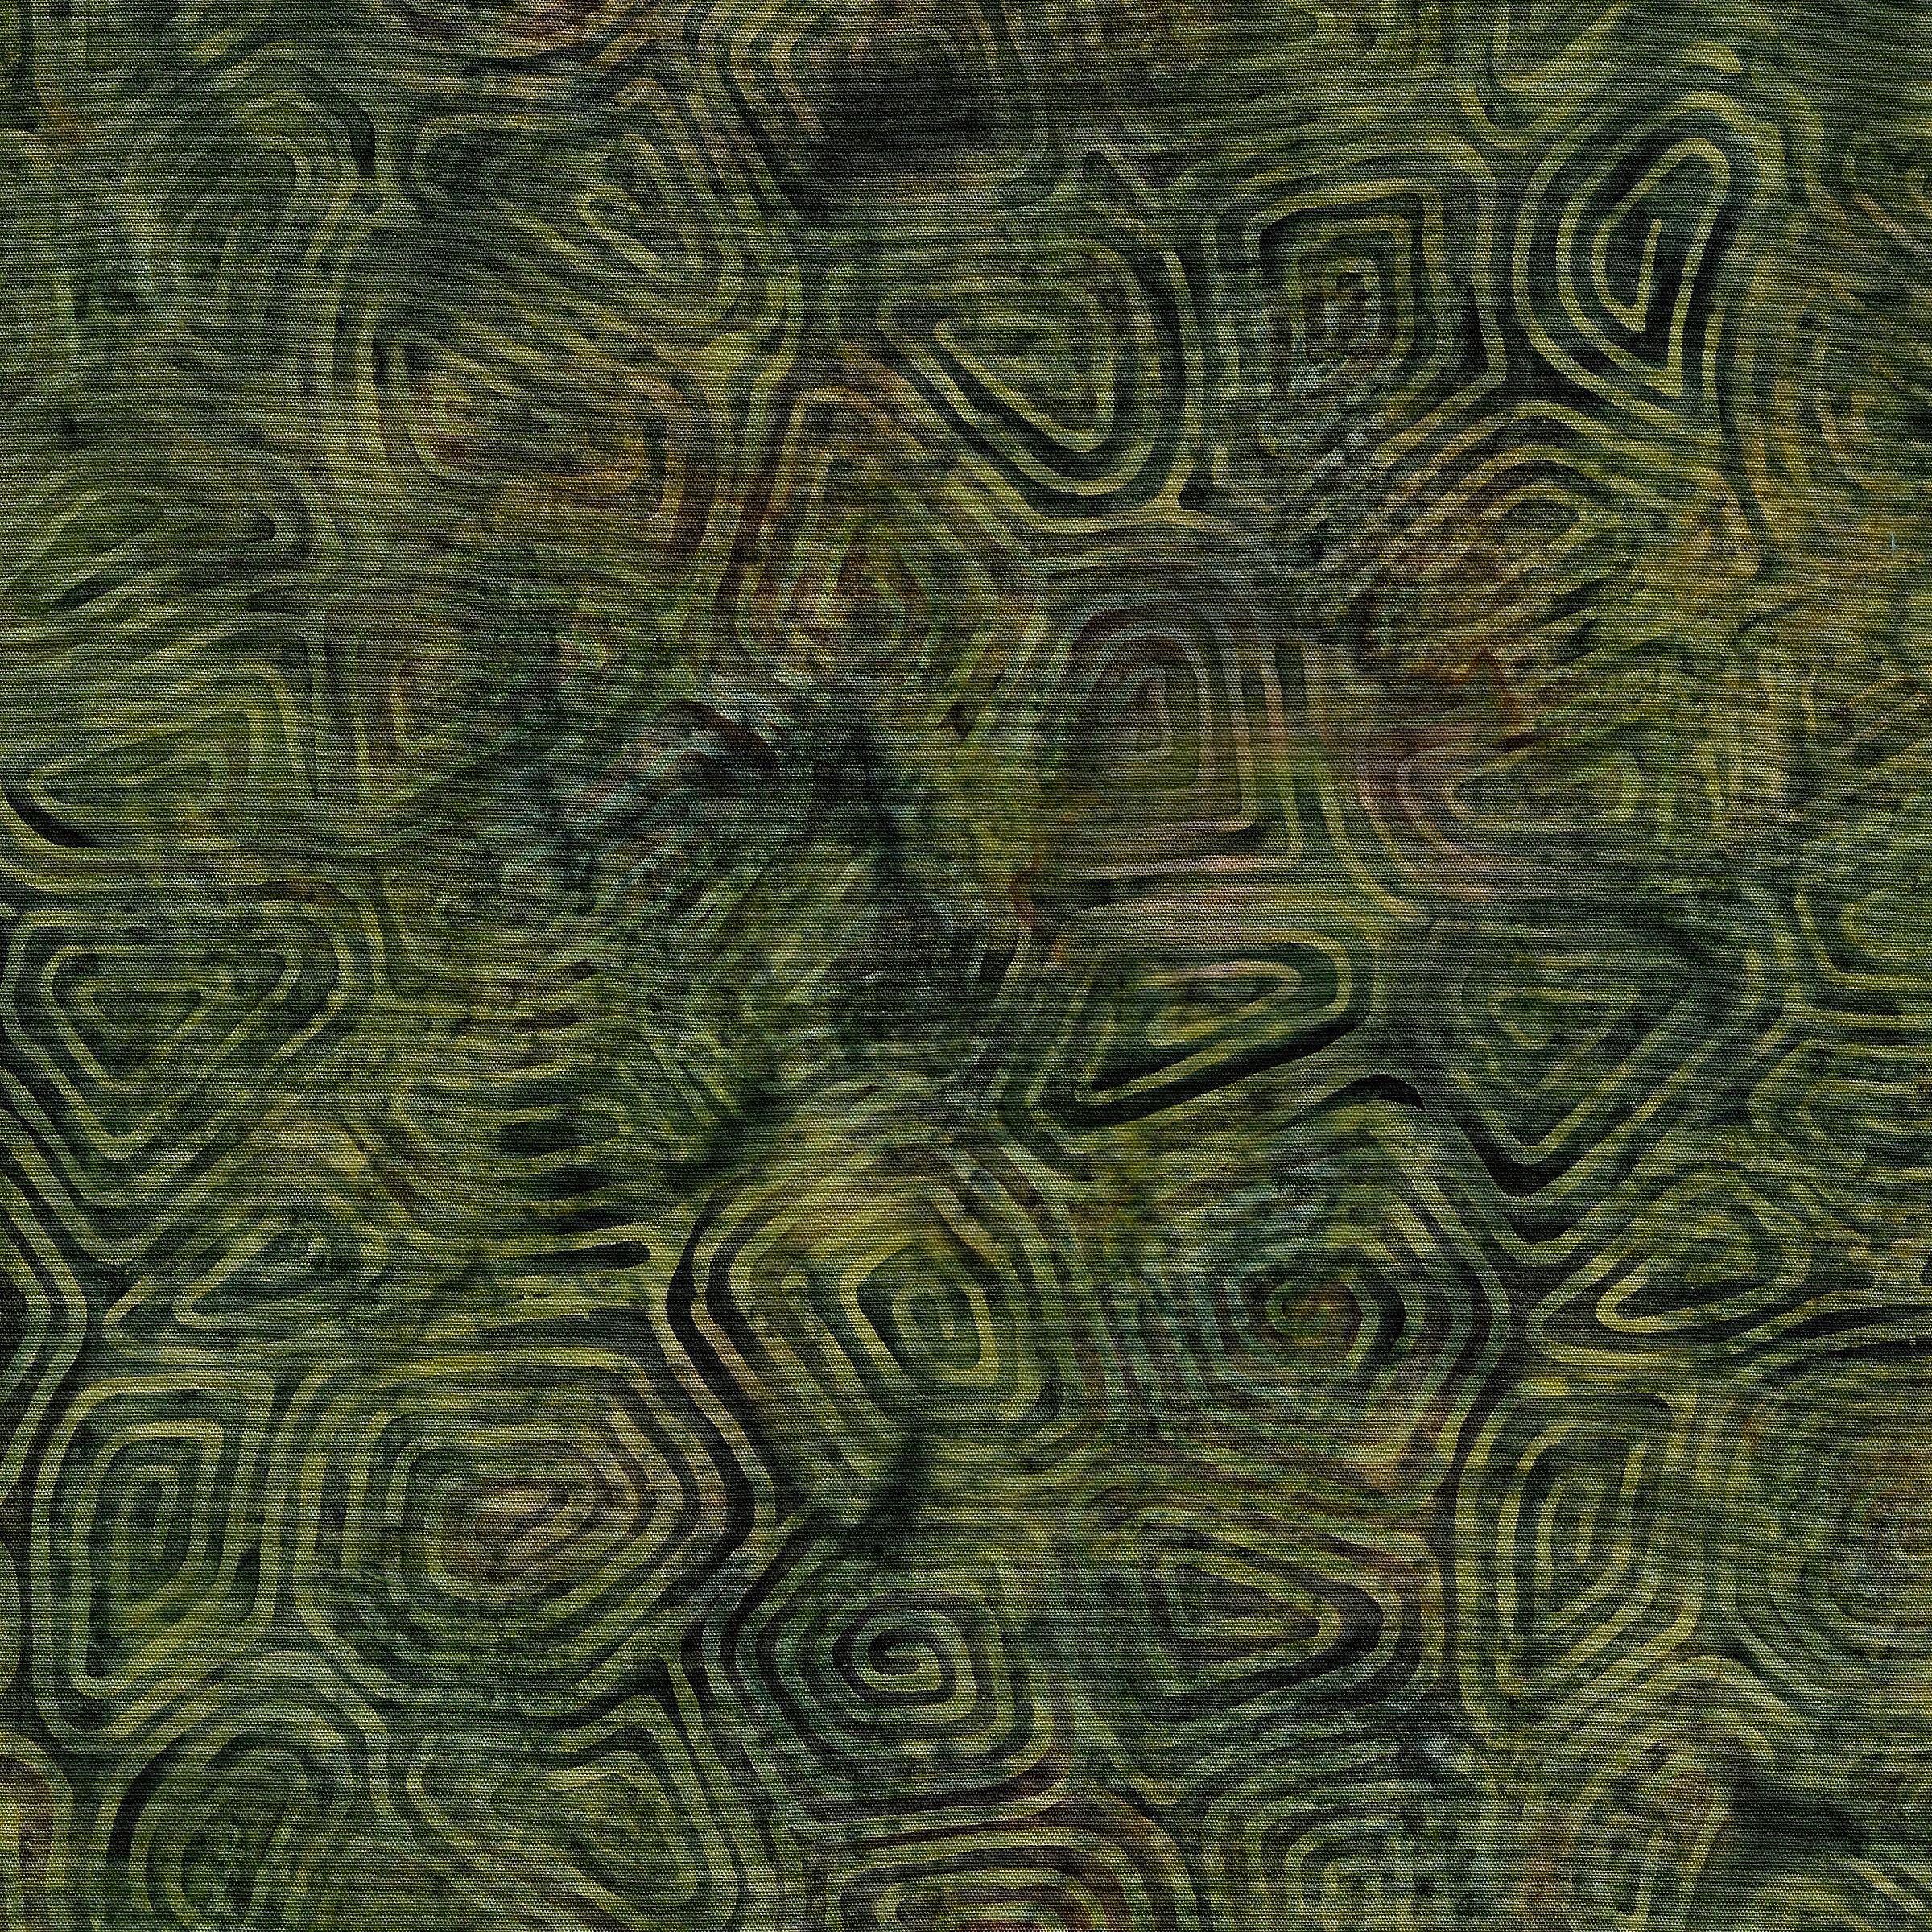 ISLAND BATIK111902685 / Turtle Shell-Pineneedle